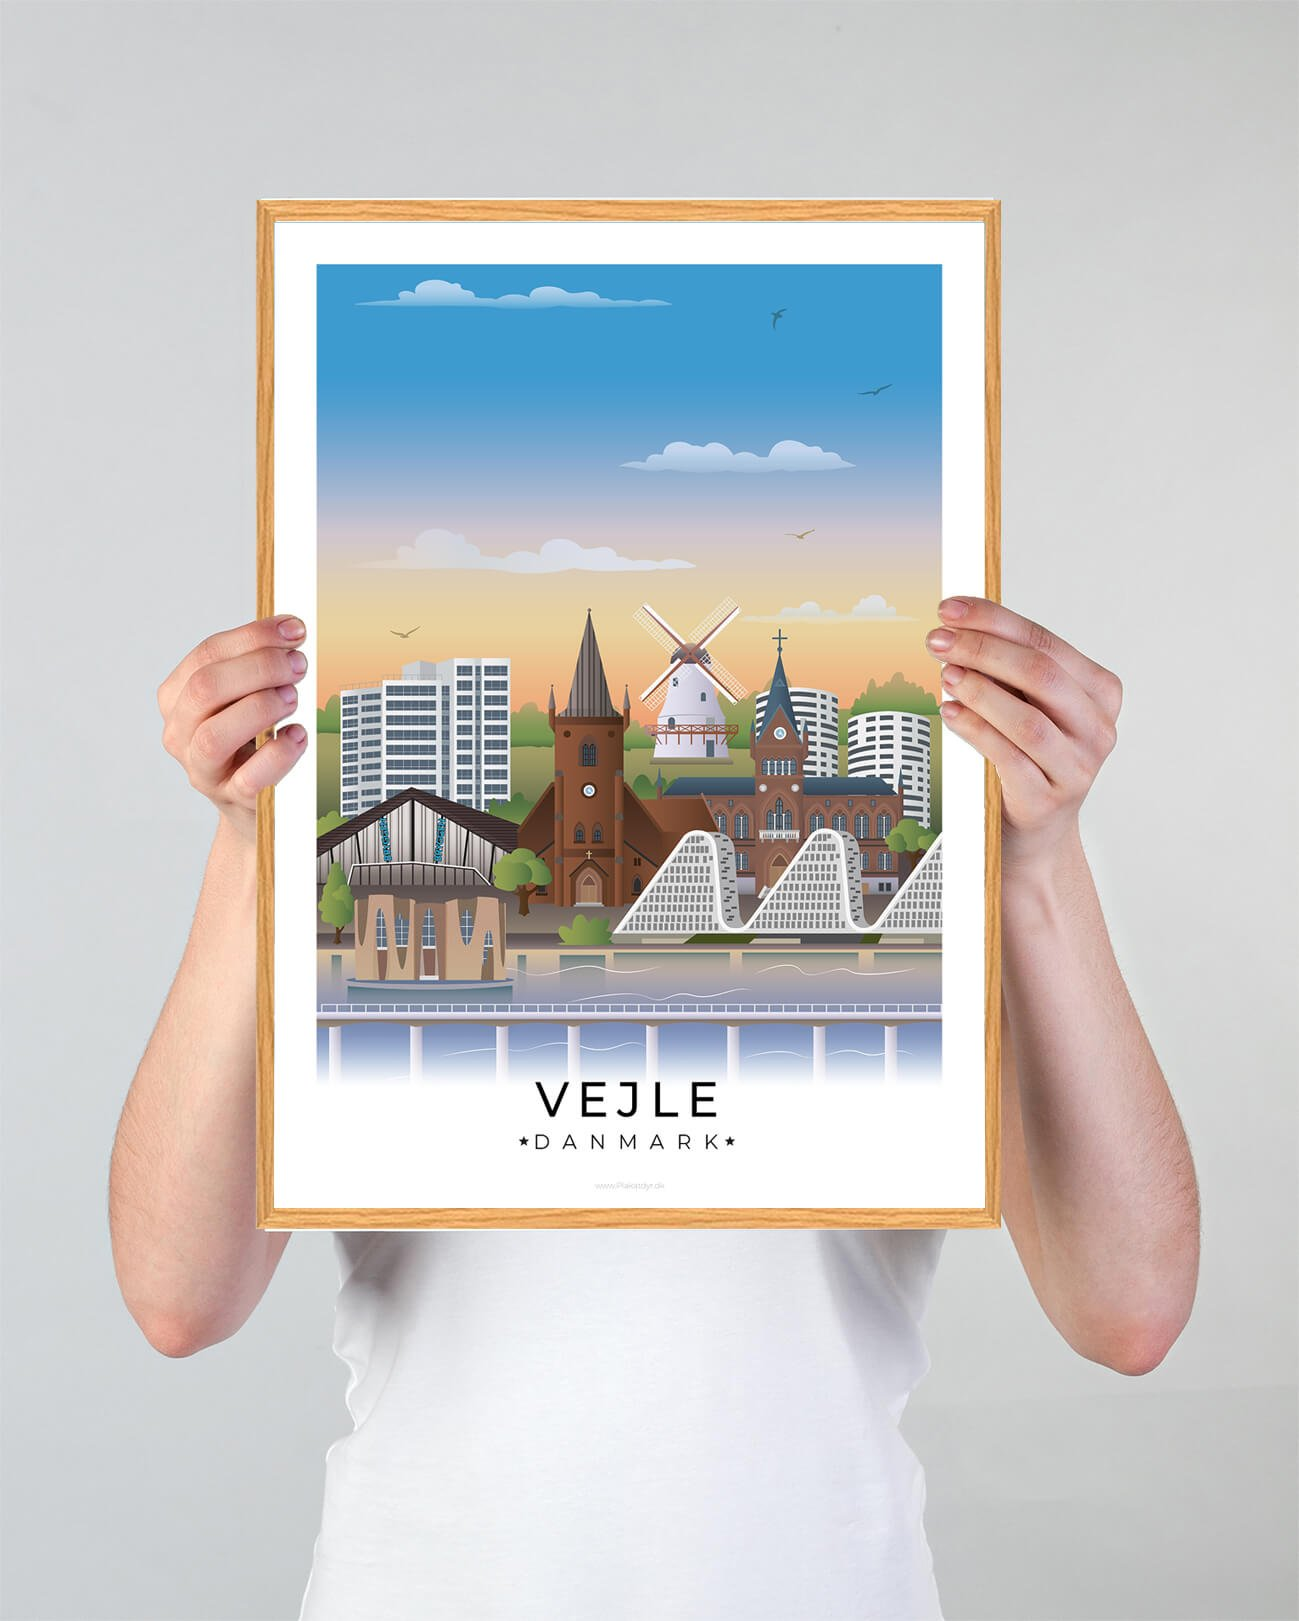 Vejle-plakat-boligen-3